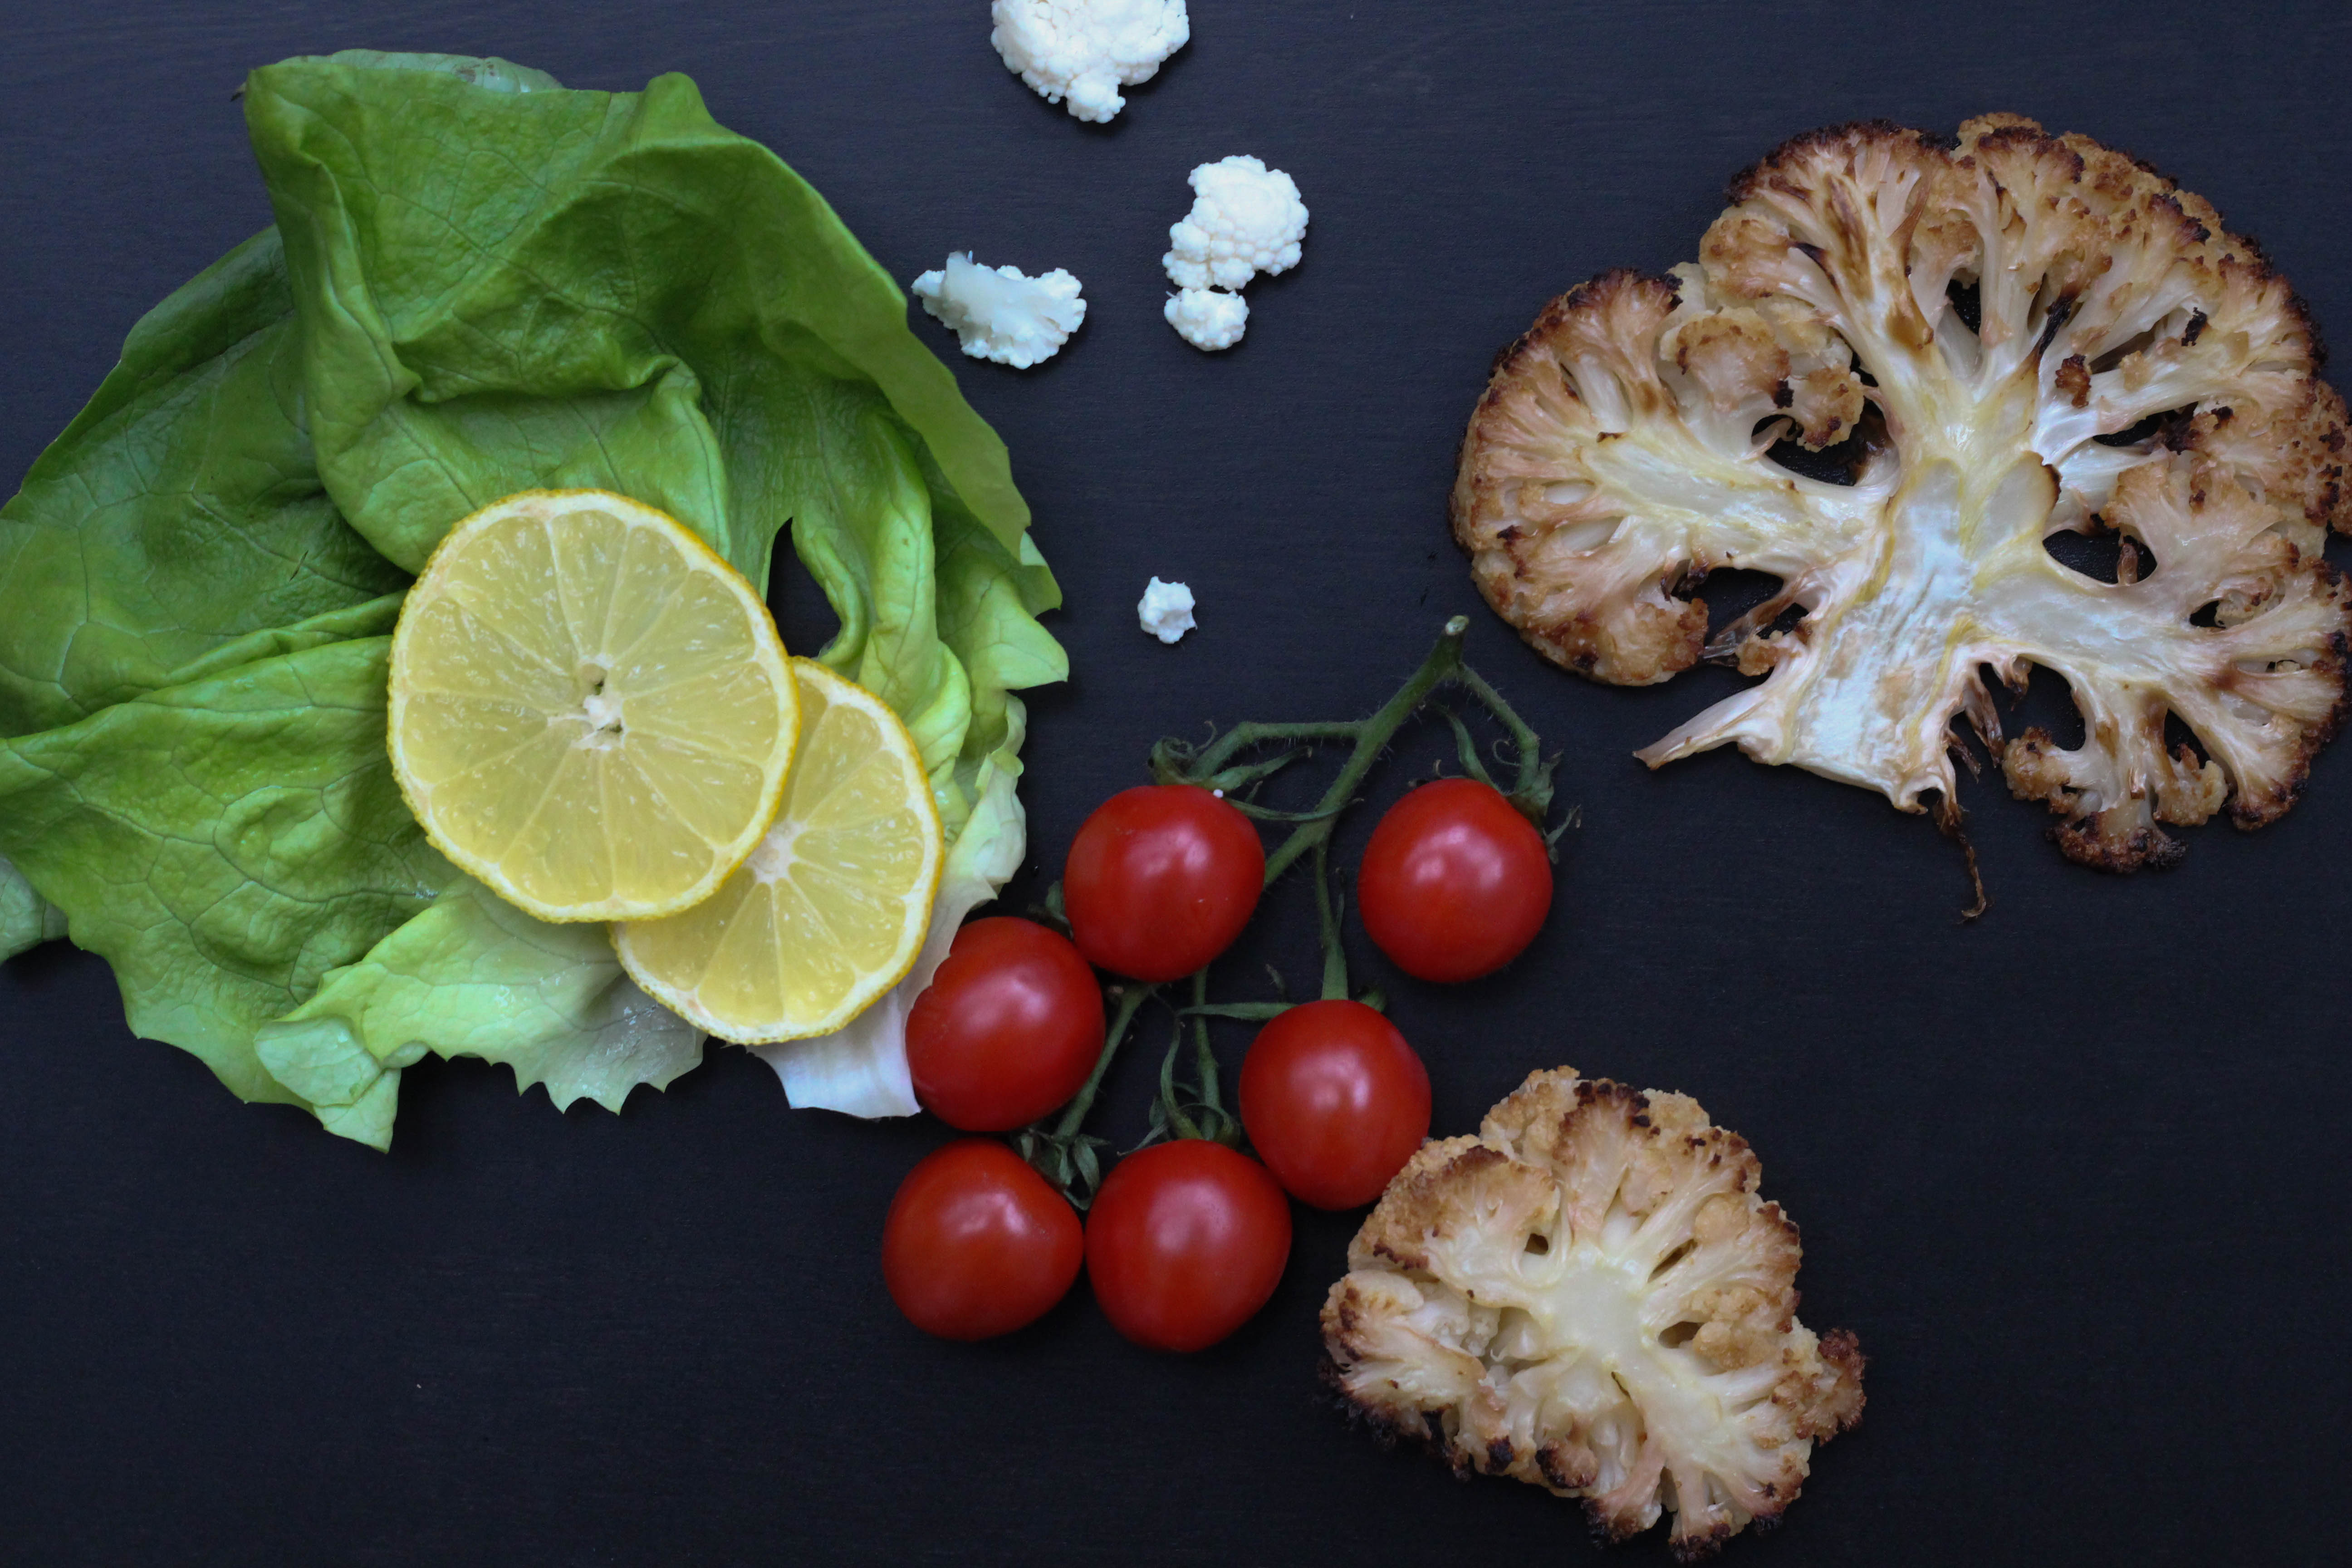 Vegan - Ofen - Blumekohl - Karfiol -Homespa -Plantbased - Healthy